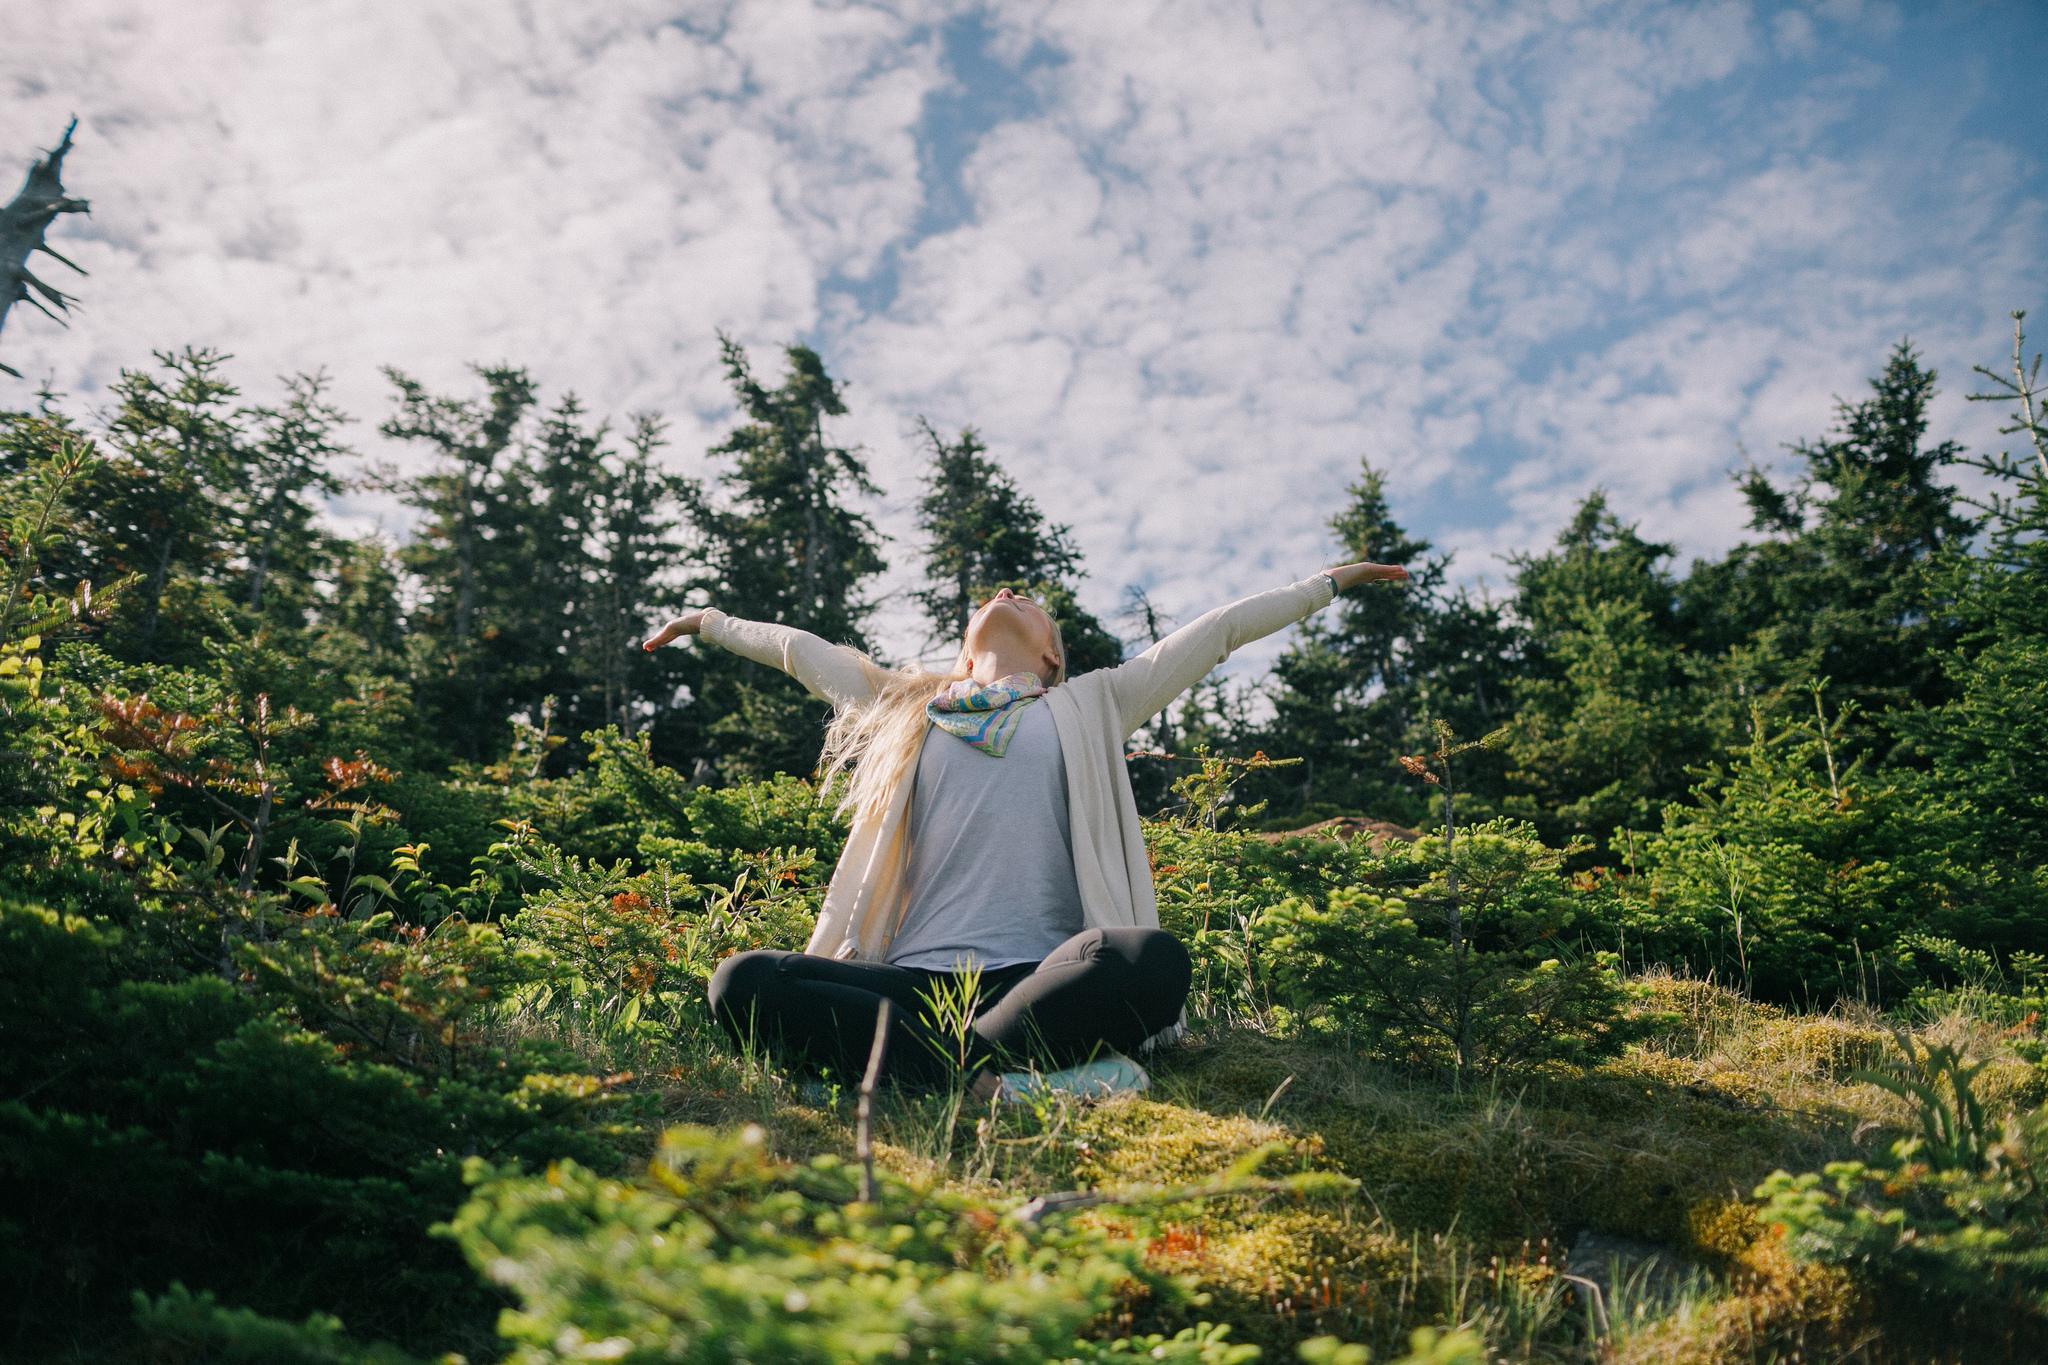 LUXURY RETREATS: HEALING RETREATS